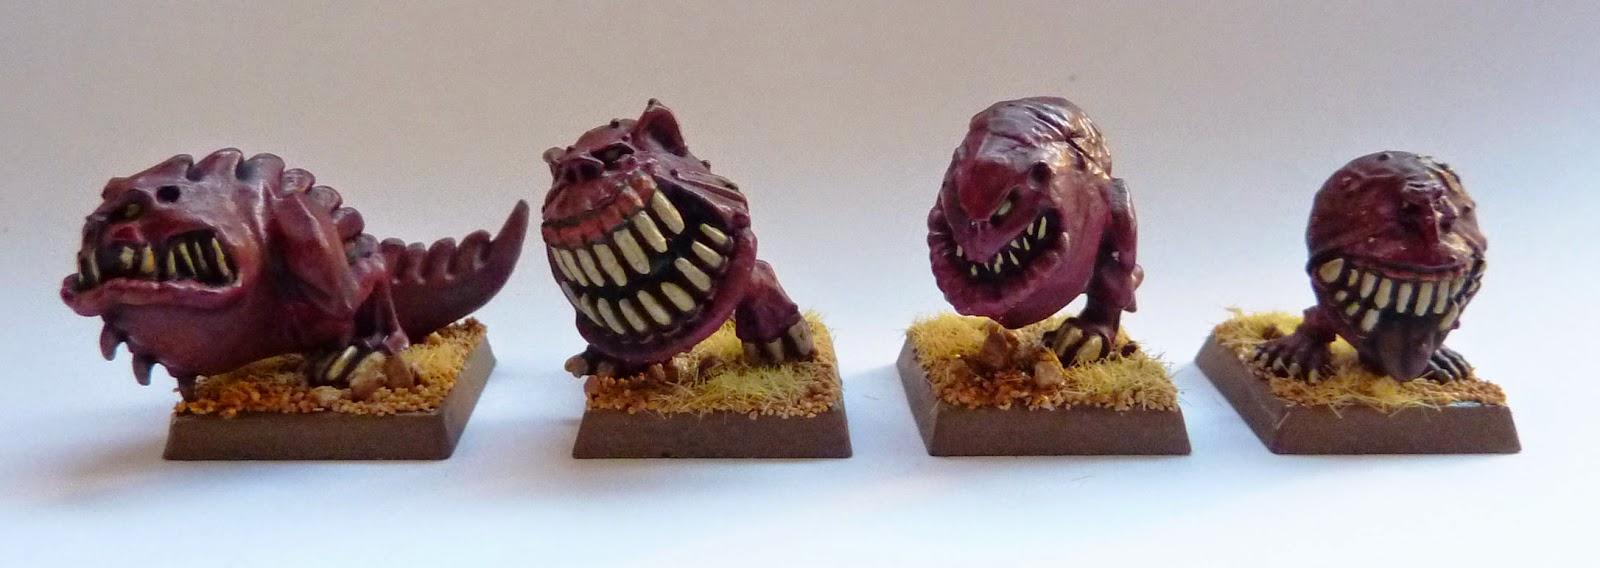 Warhammer Fantasy - Orcs & Goblins Cave Squigs